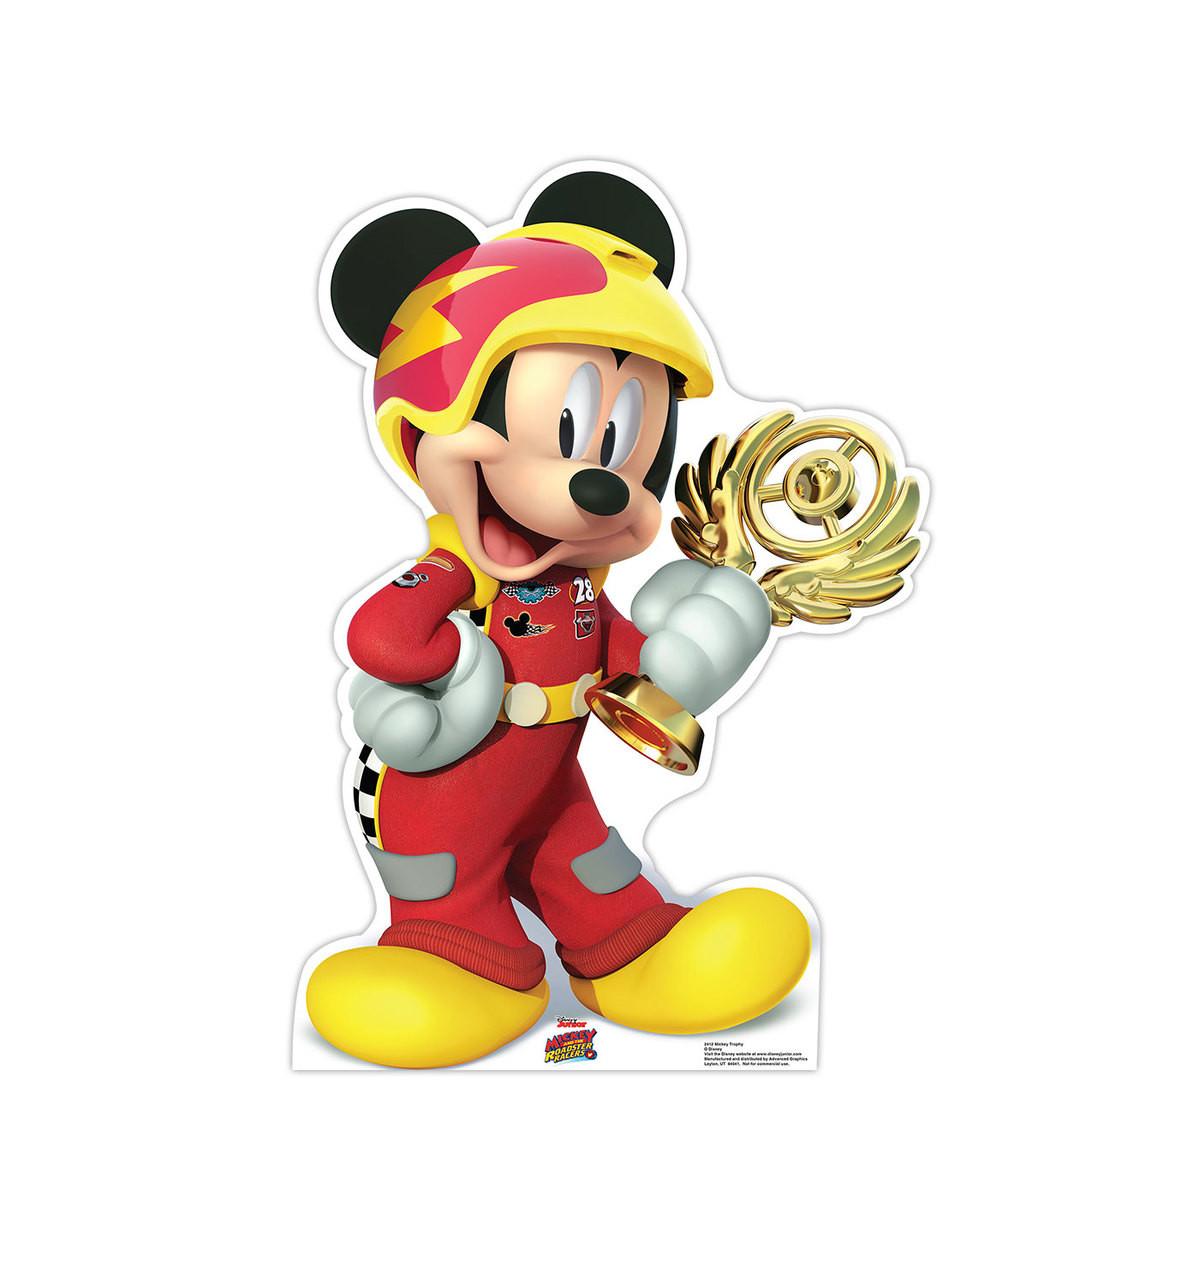 Life-size Mickey Trophy (Disney's Roadster Racers) Cardboard Standup 3